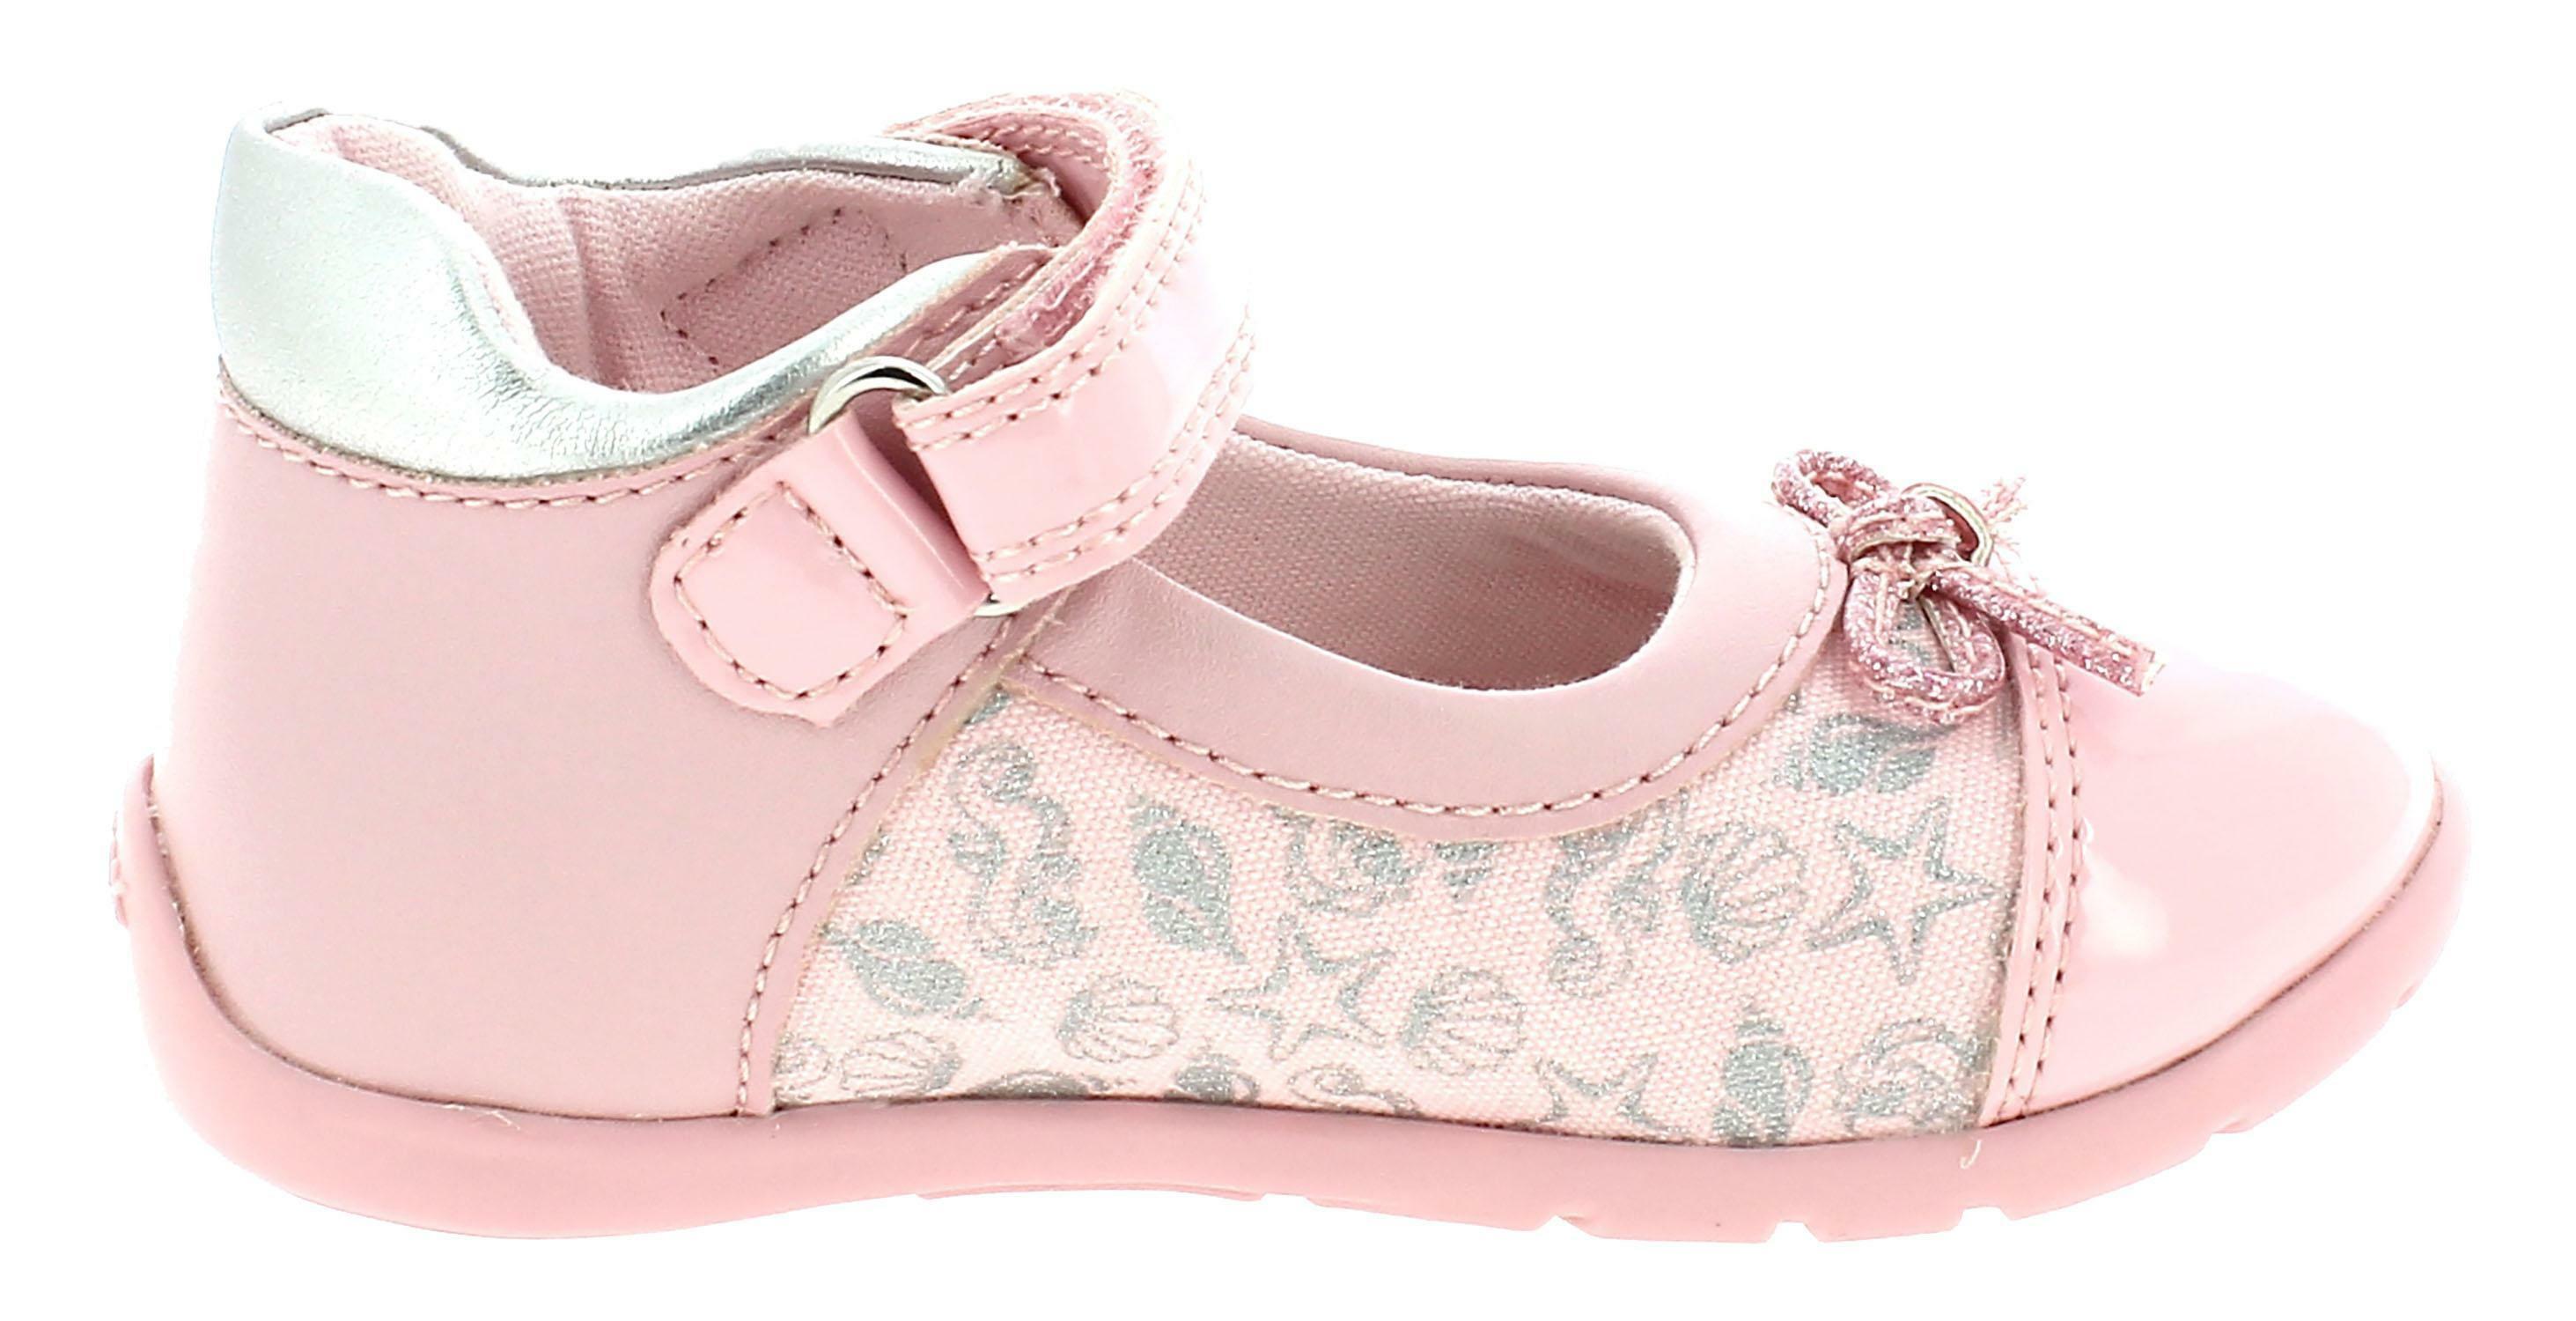 geox b elthan g ballerine bambina rosa b821qcc0514